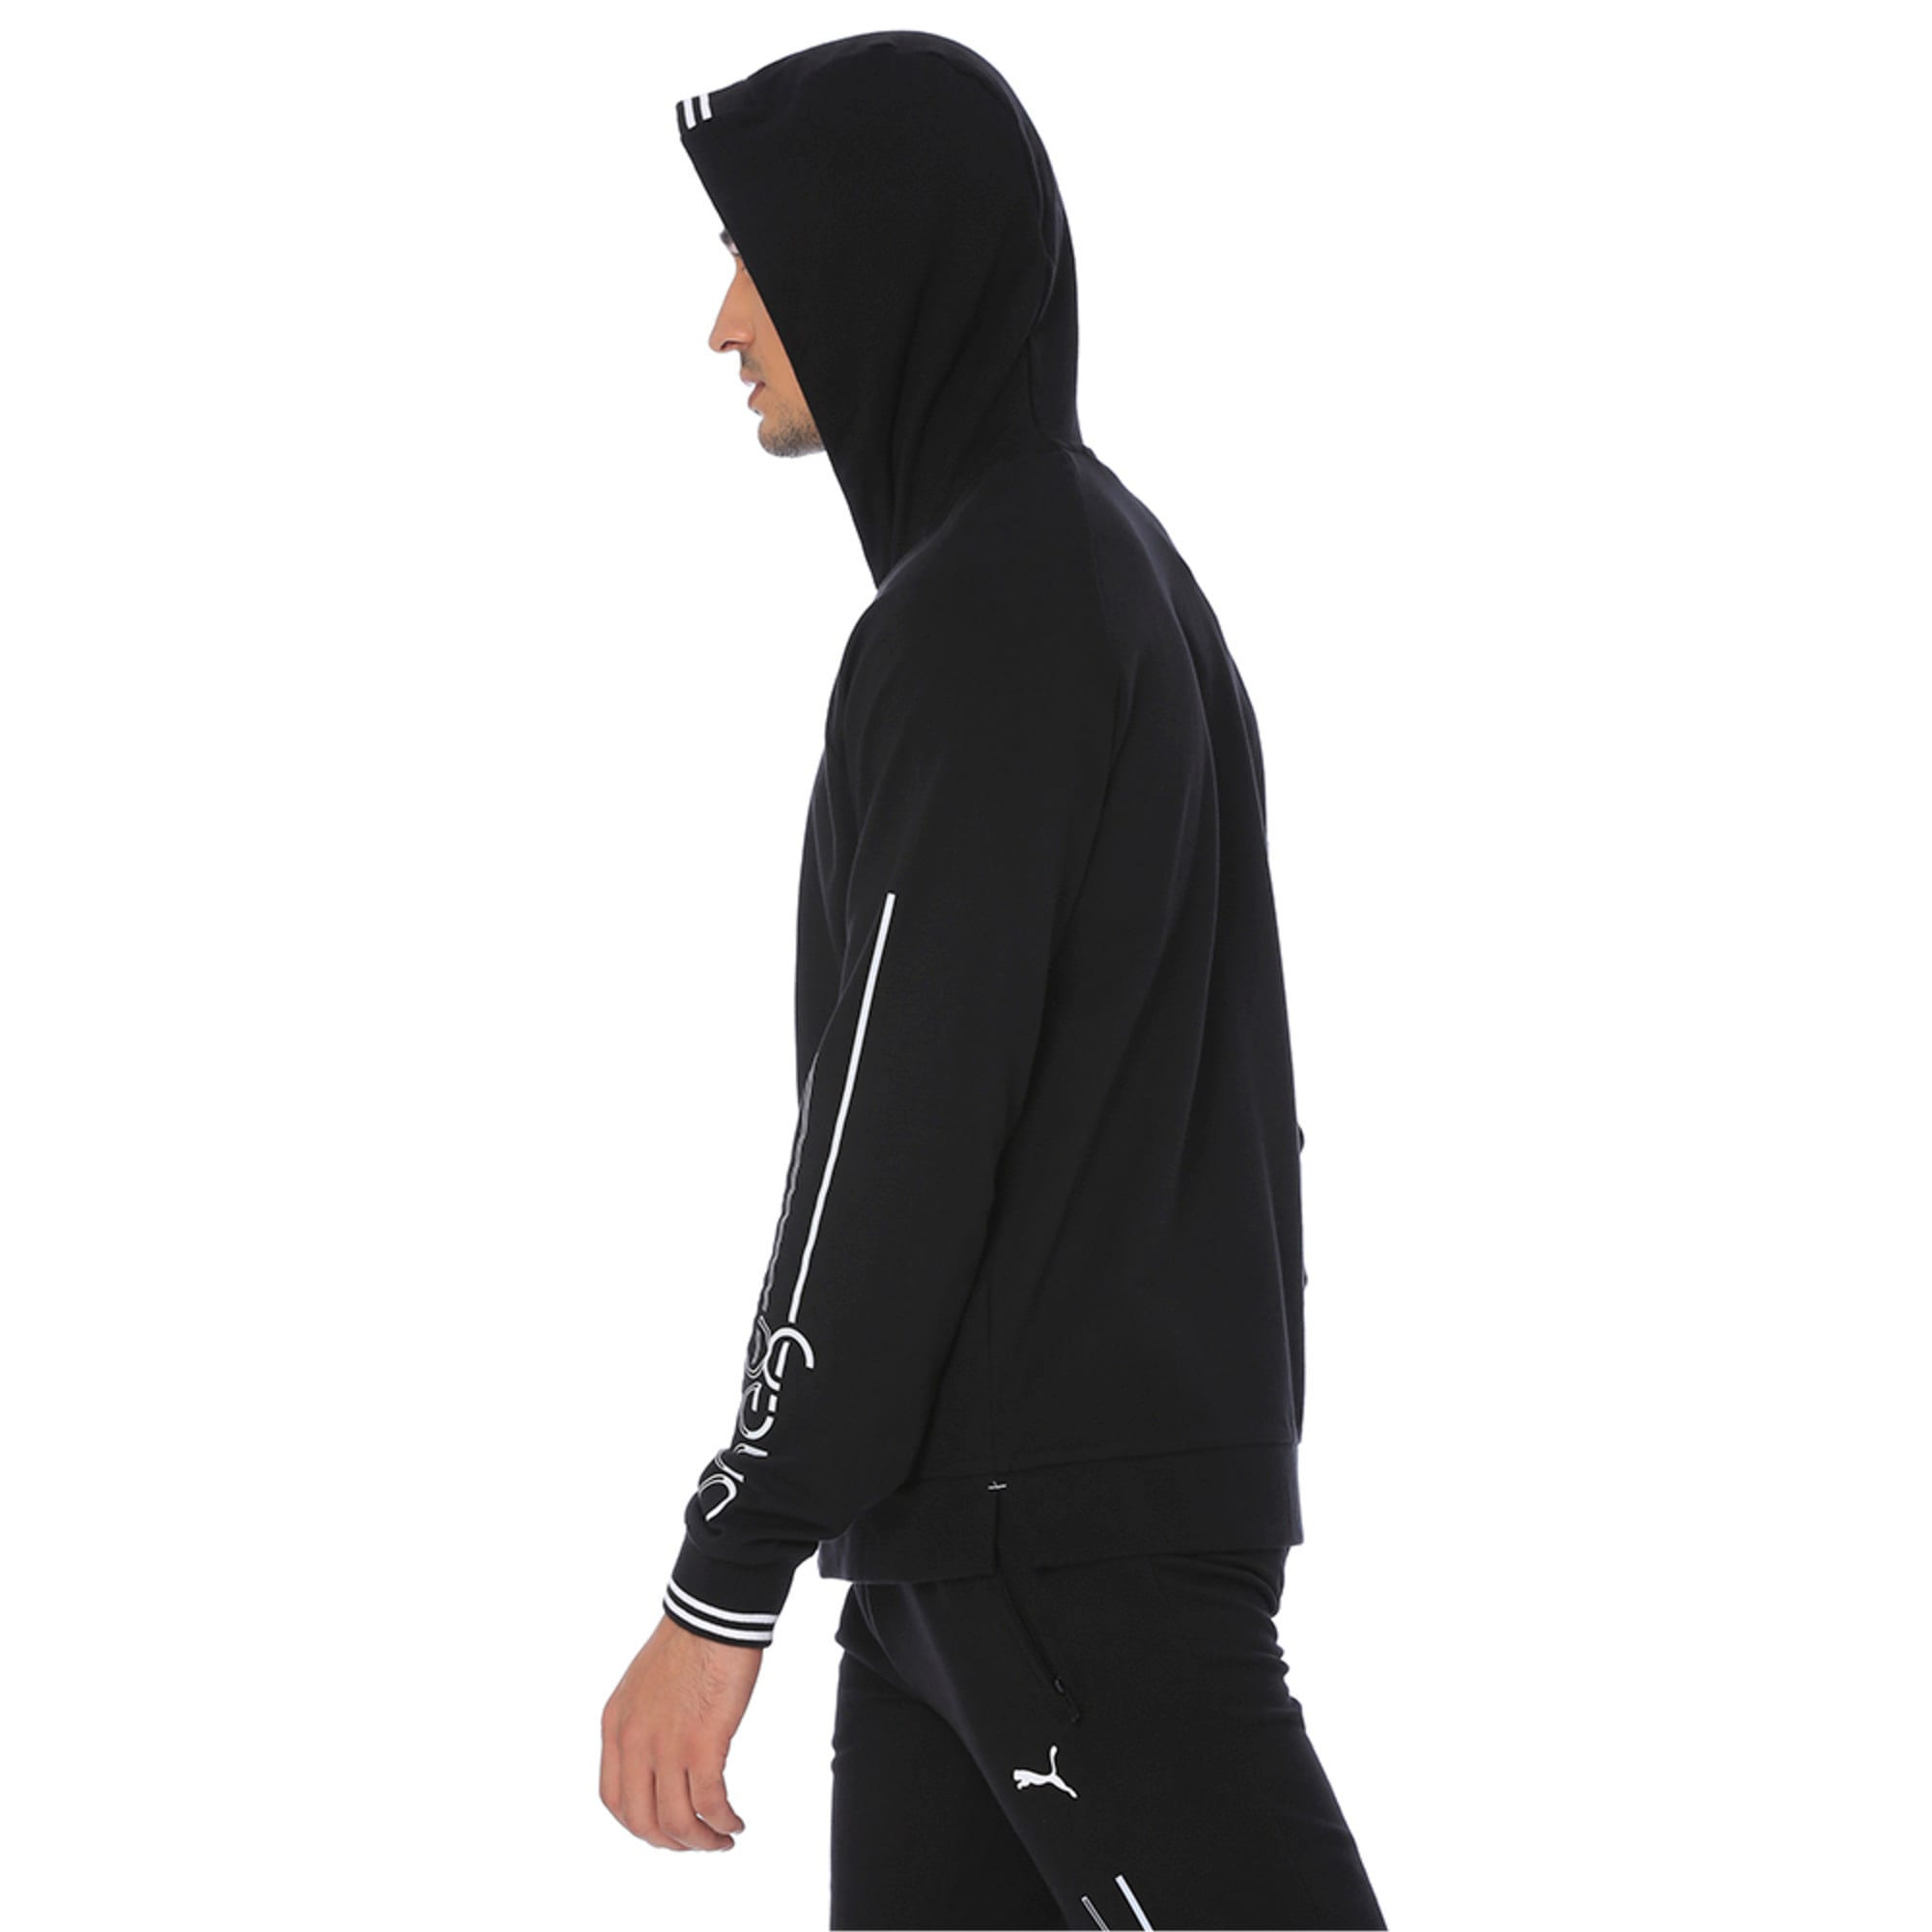 Thumbnail 2 of one8 Men's Hooded Track Jacket, Puma Black, medium-IND